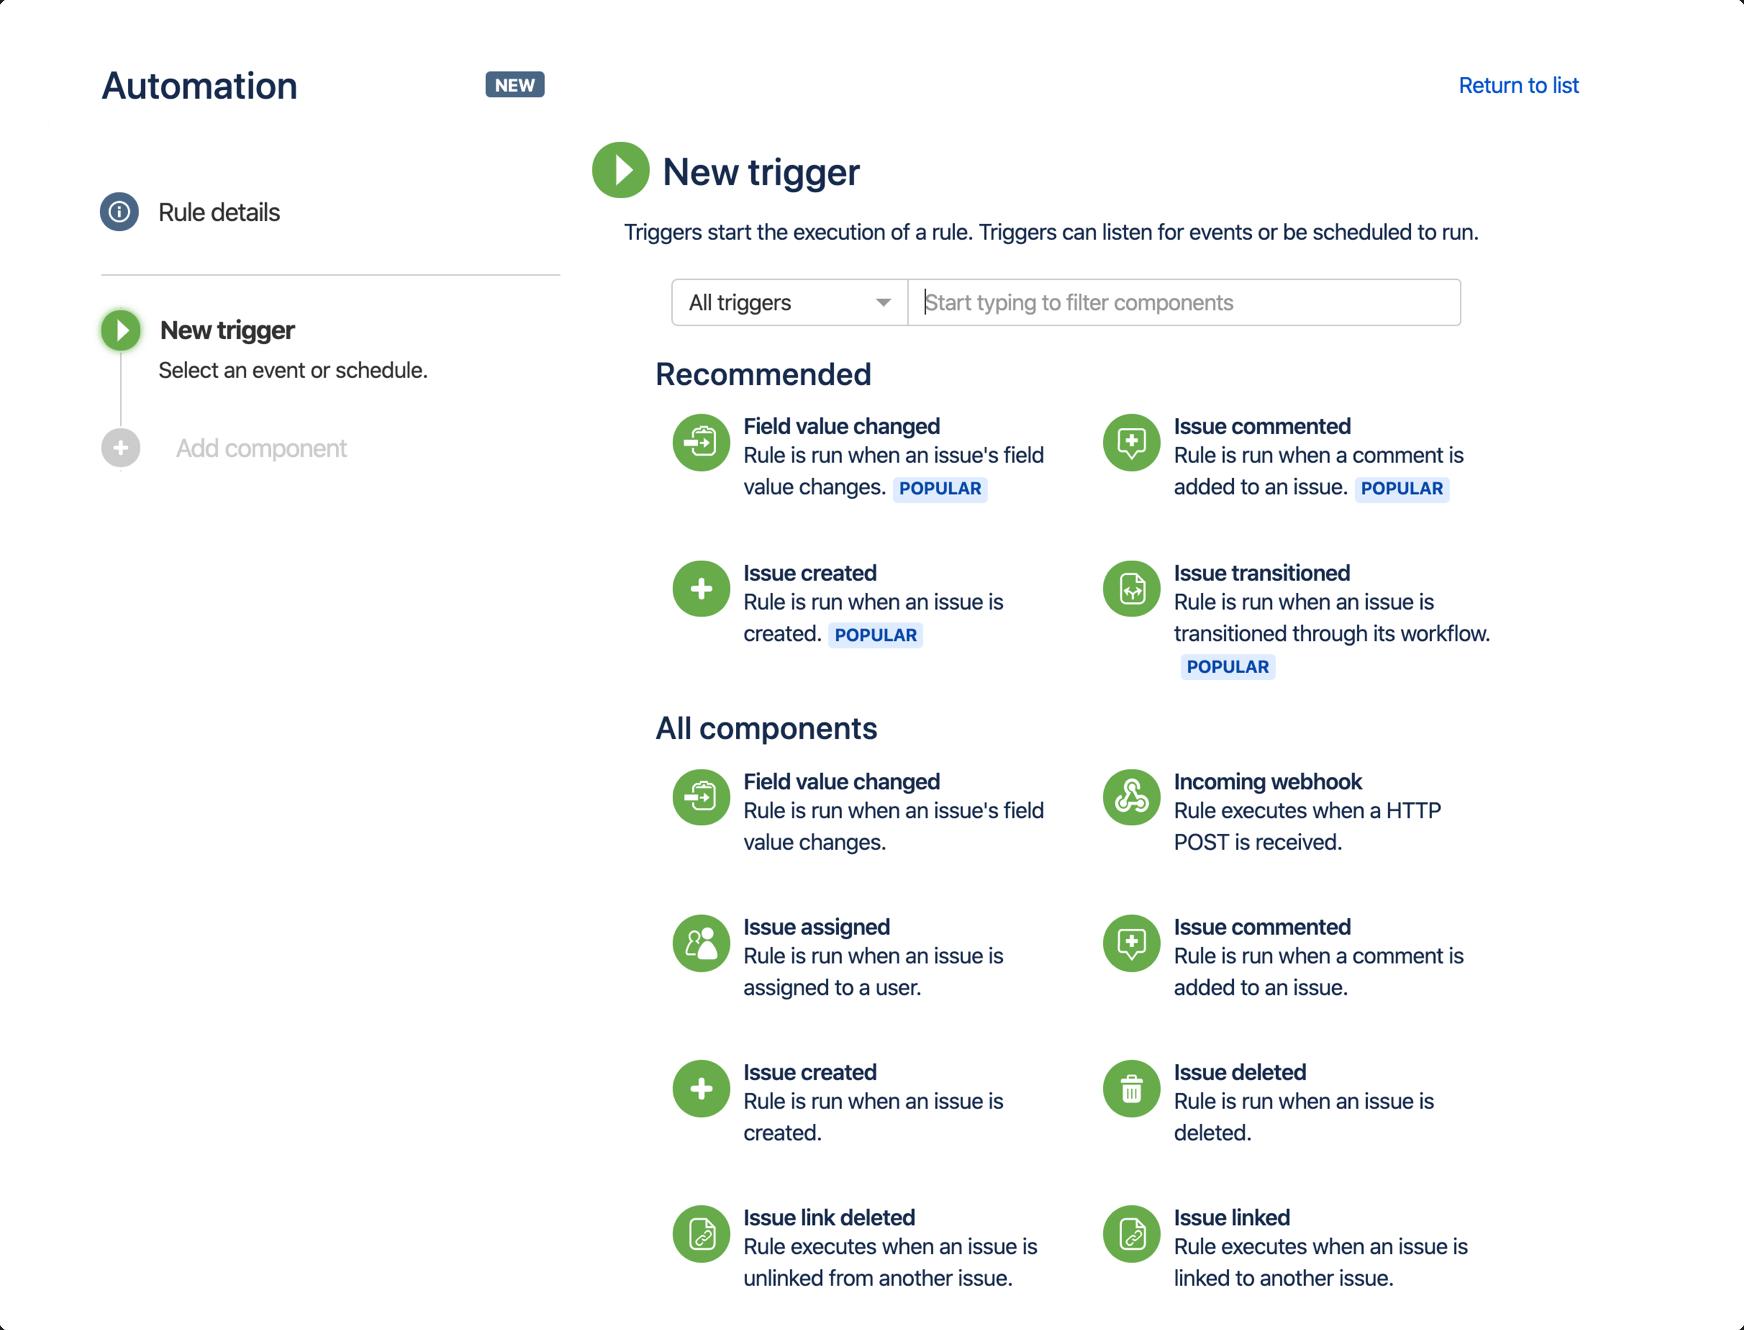 Снимок экрана: правила автоматизации одного проекта